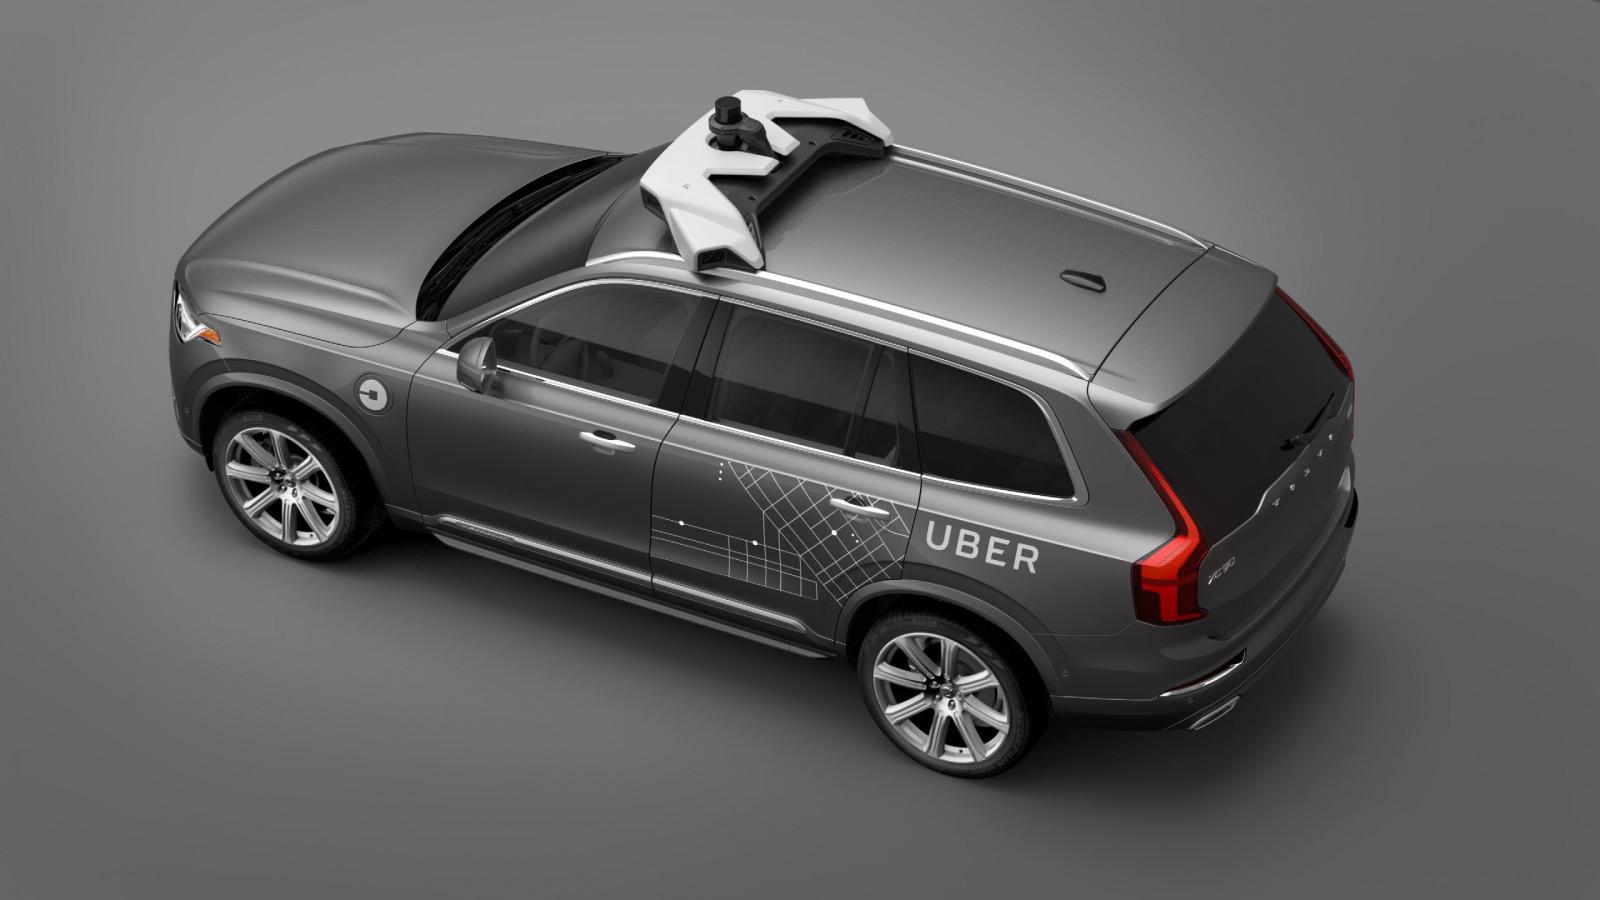 Uber Vovlo XC90 sport